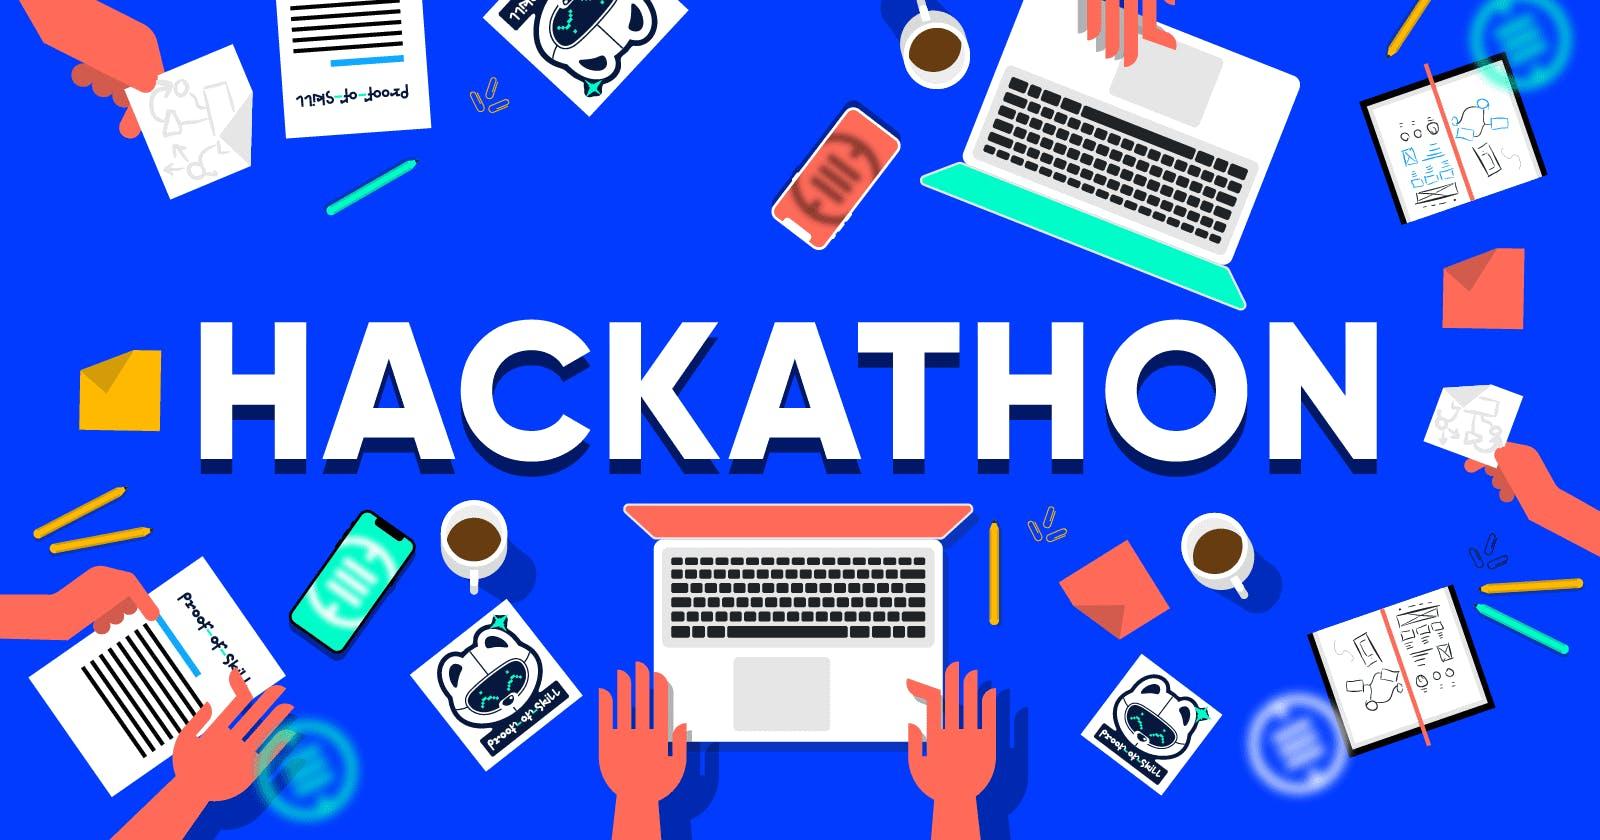 This Hashnode Hackathon gave me my next startup Idea